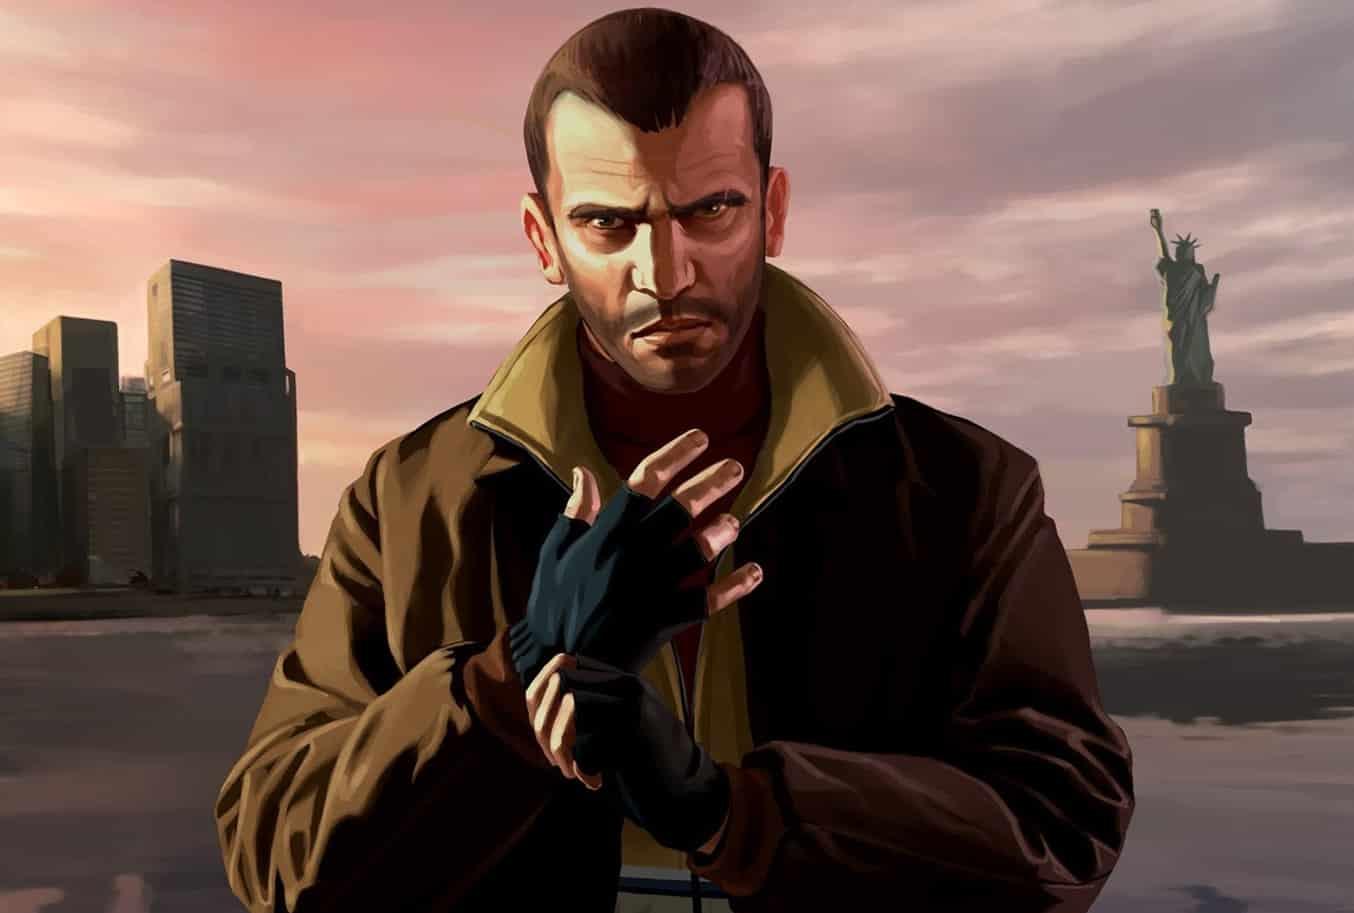 Games for Windows Live, Grand Theft Auto IV, Rockstar Games, Steam